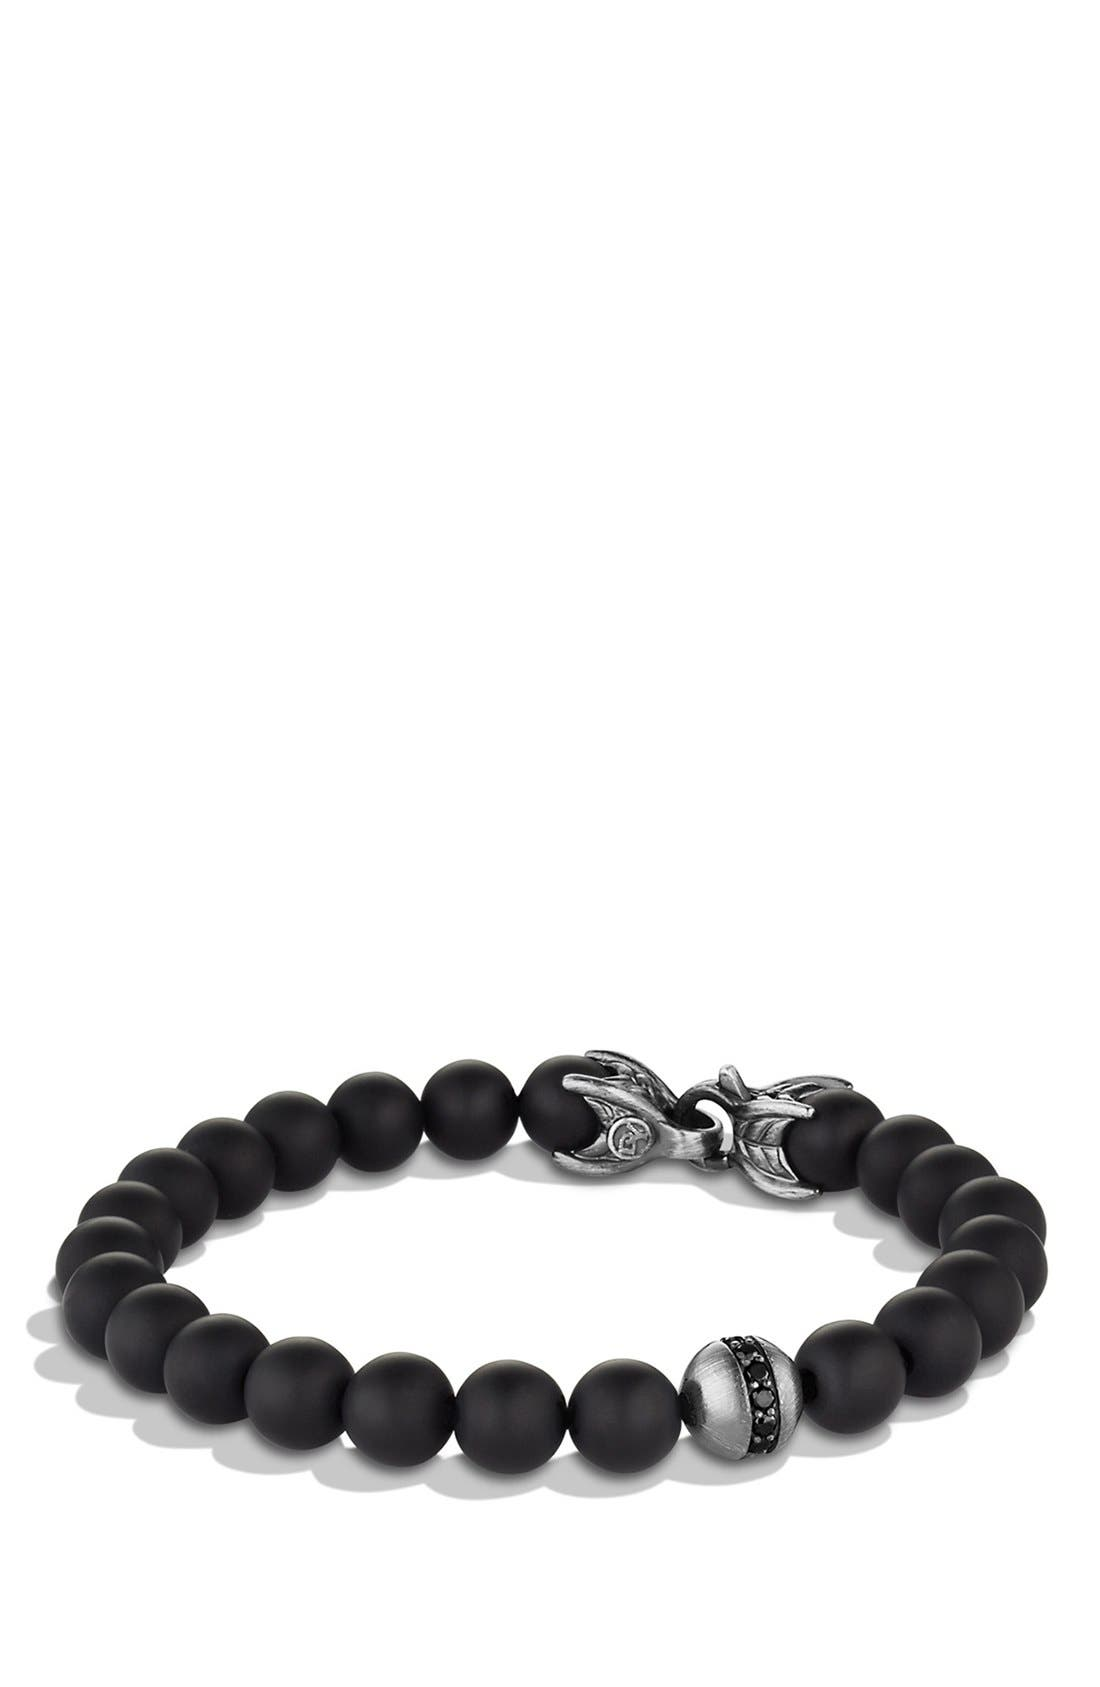 'Spiritual Beads' Bracelet with Black Onyx and Black Diamonds,                         Main,                         color, BLACK ONYX